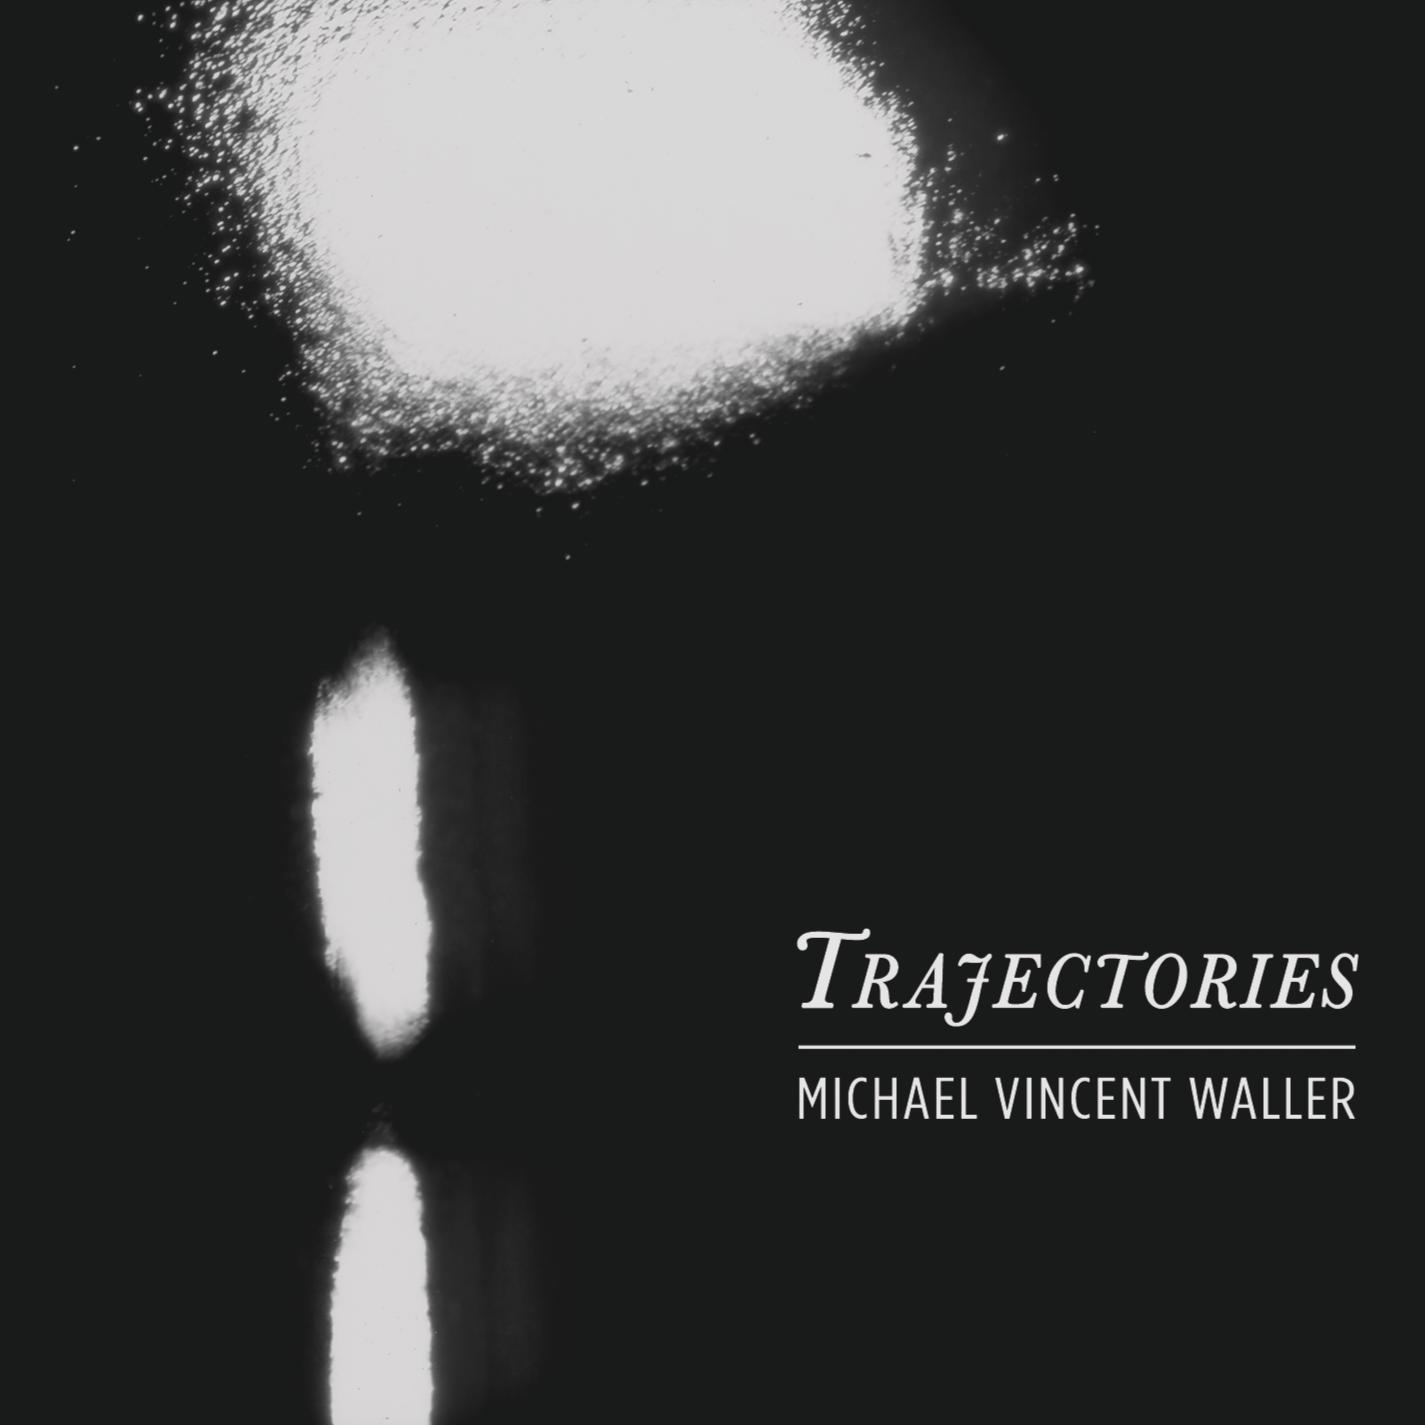 Trajectories Michael Vincent Waller digital booklet-01.png